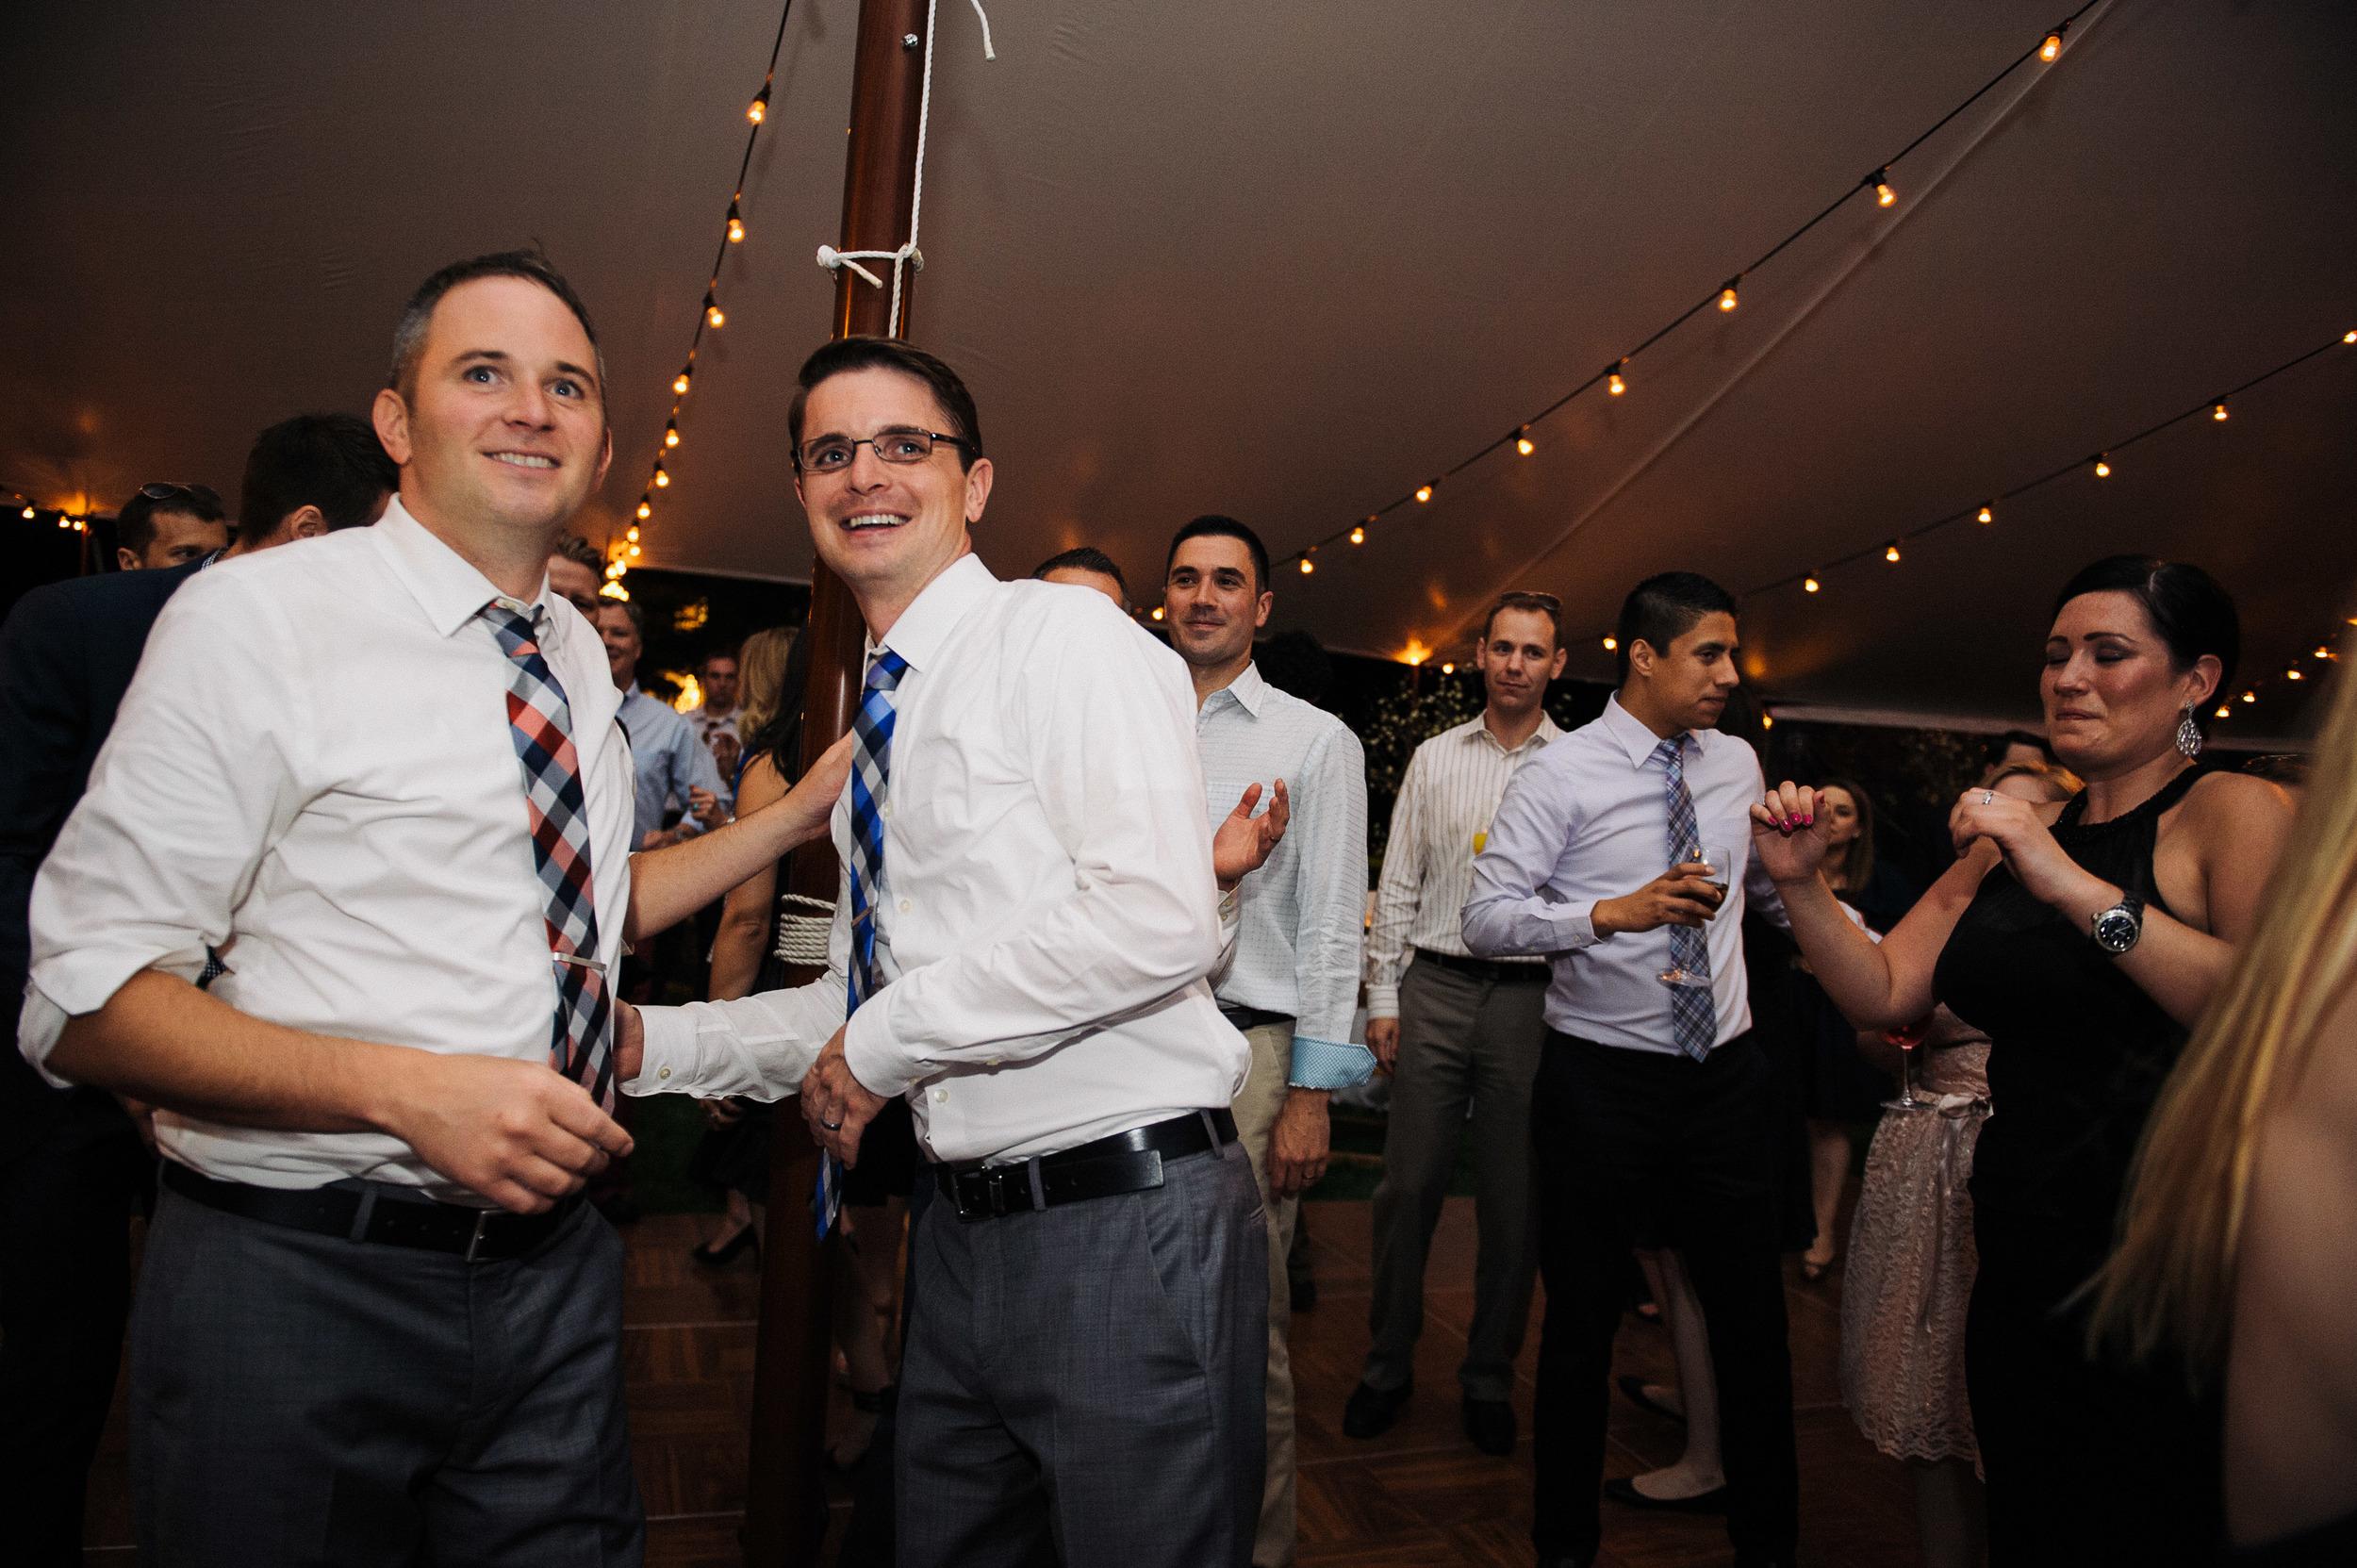 Aviation Themed Wedding Gay Wedding LGBT367.JPG